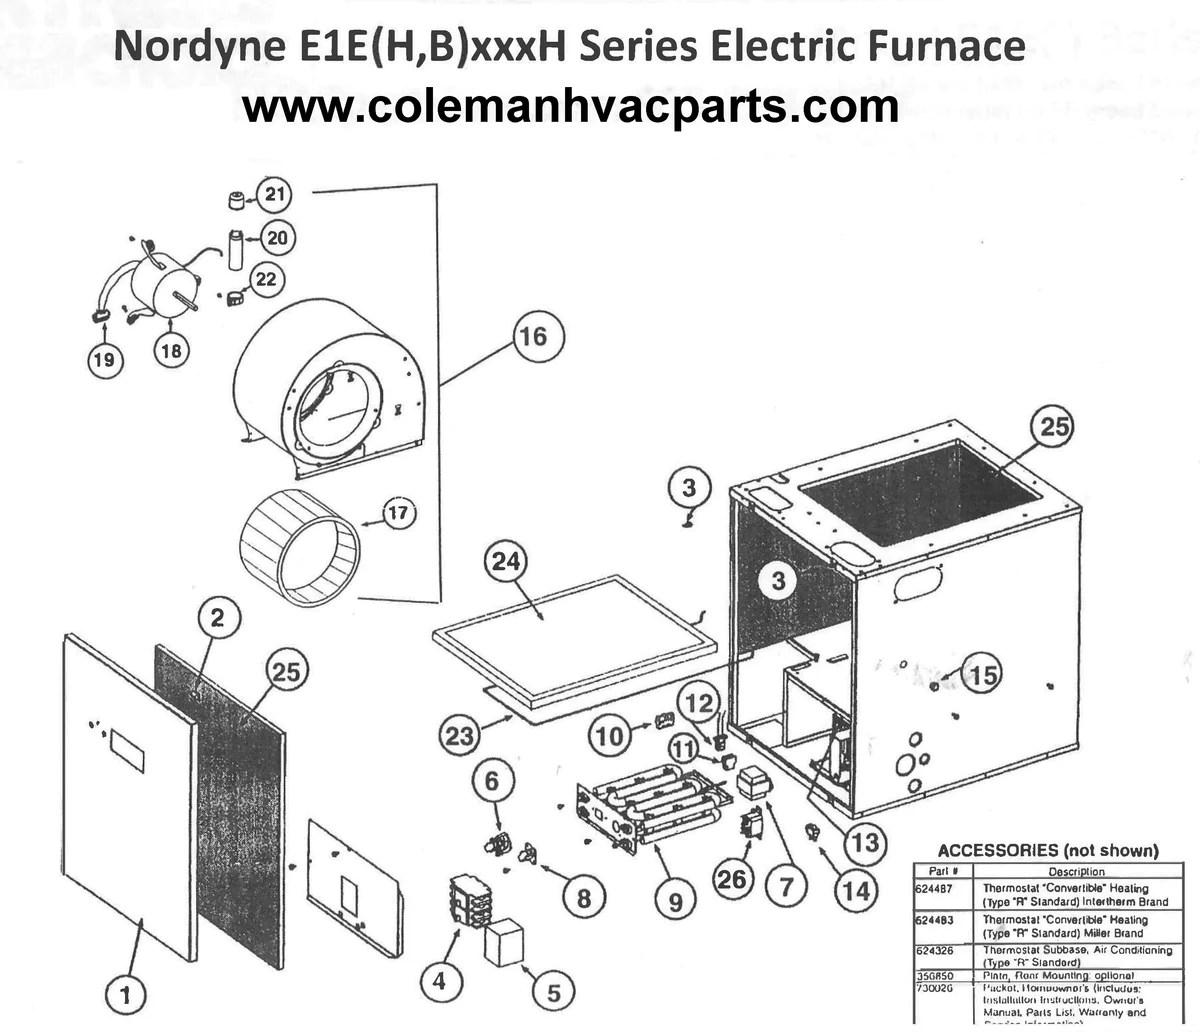 hight resolution of e1eh012h nordyne electric furnace parts hvacpartstore coleman furnace parts miller furnace parts diagram